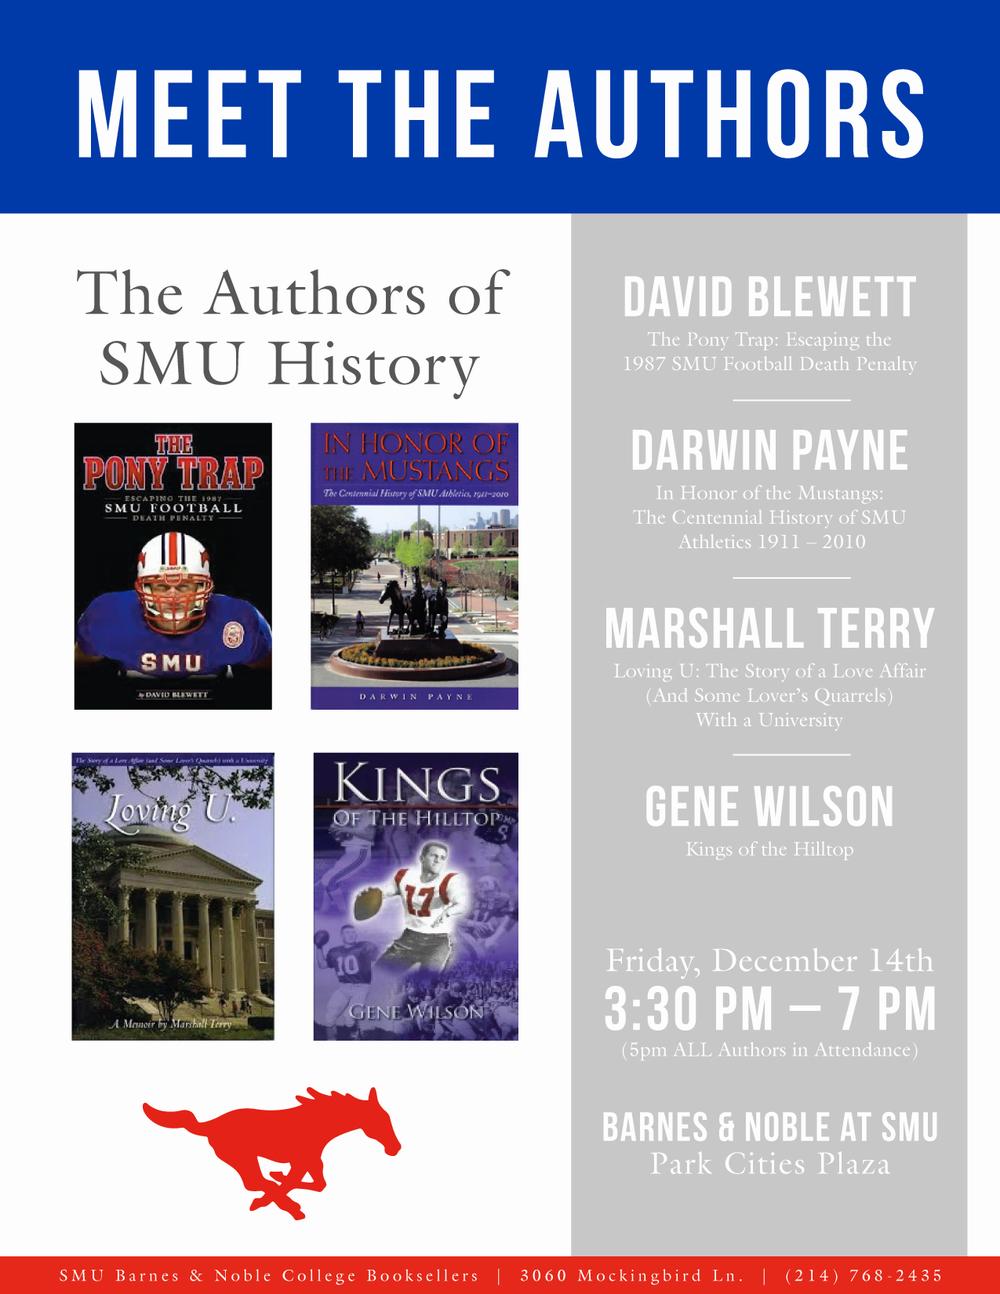 SMU Bookstore Event Flyer